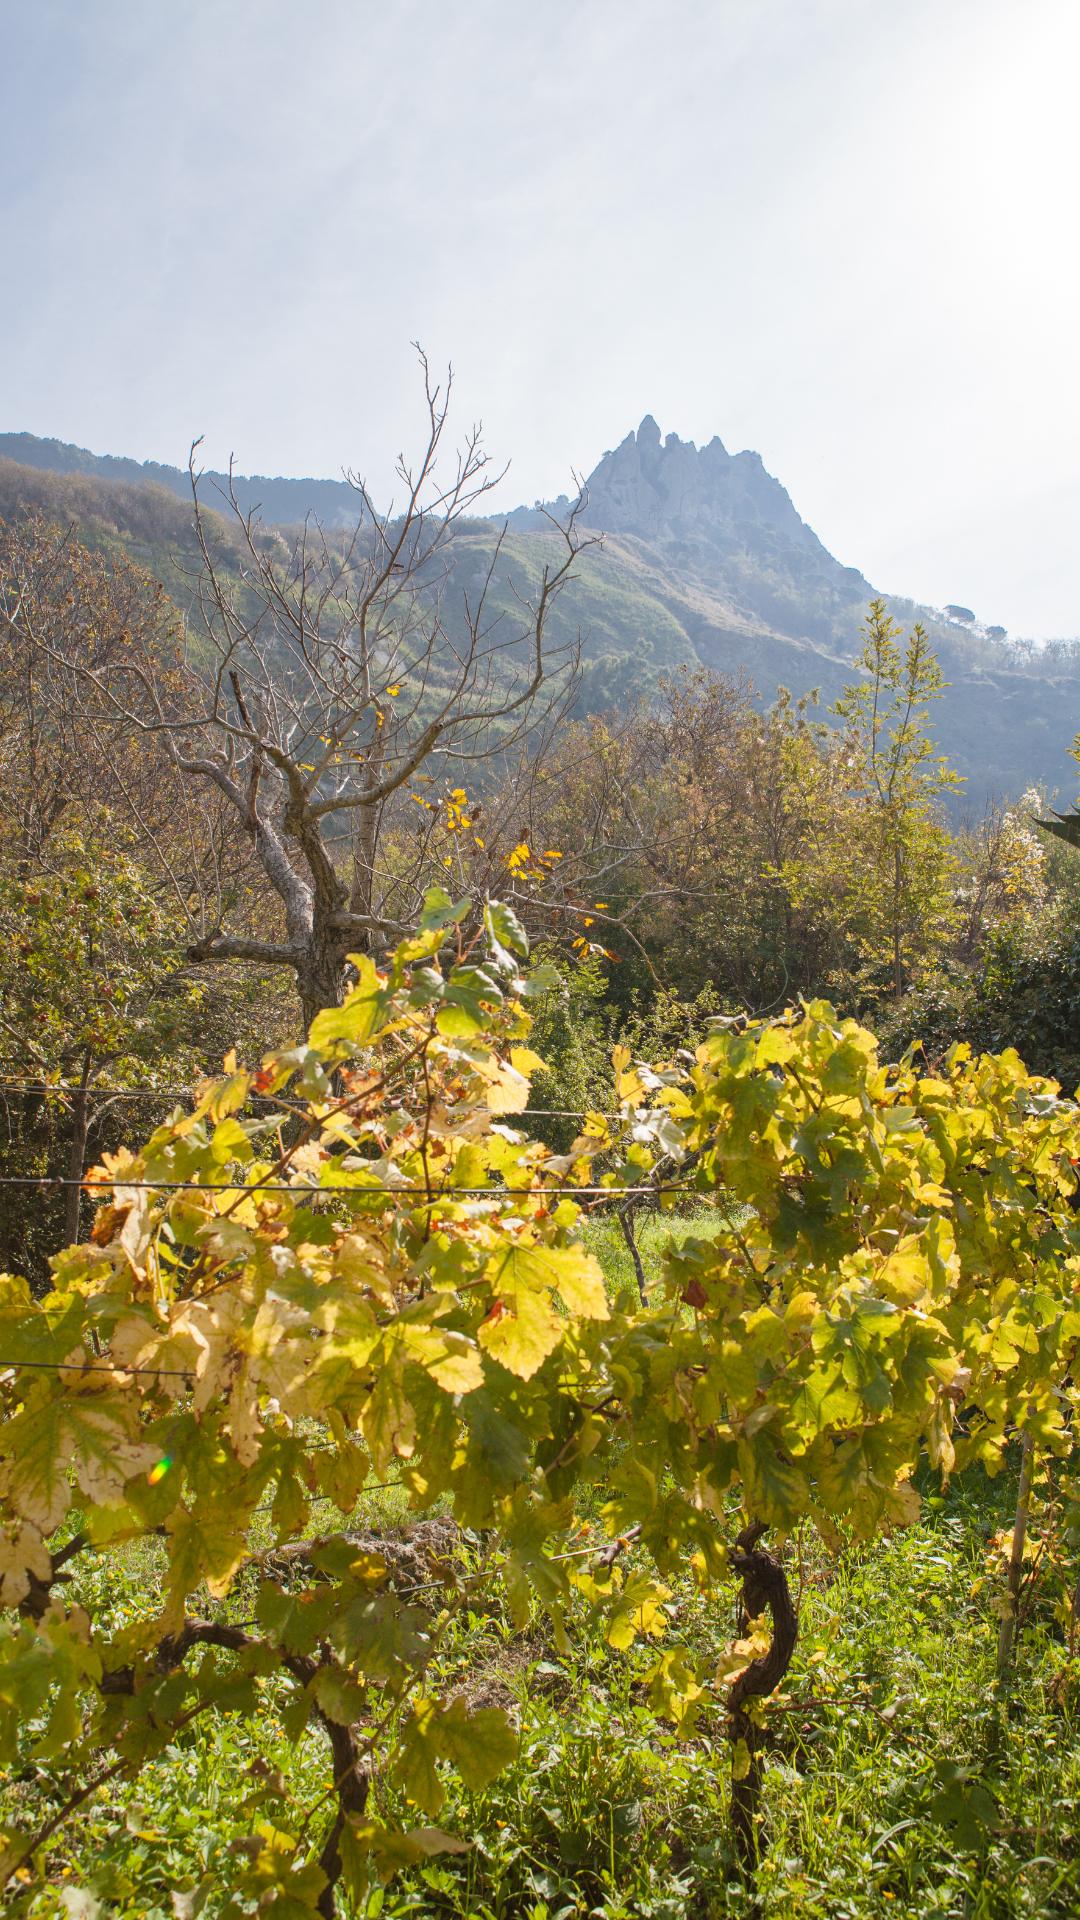 Vineyard View of Mount Eponmeo, Ischia